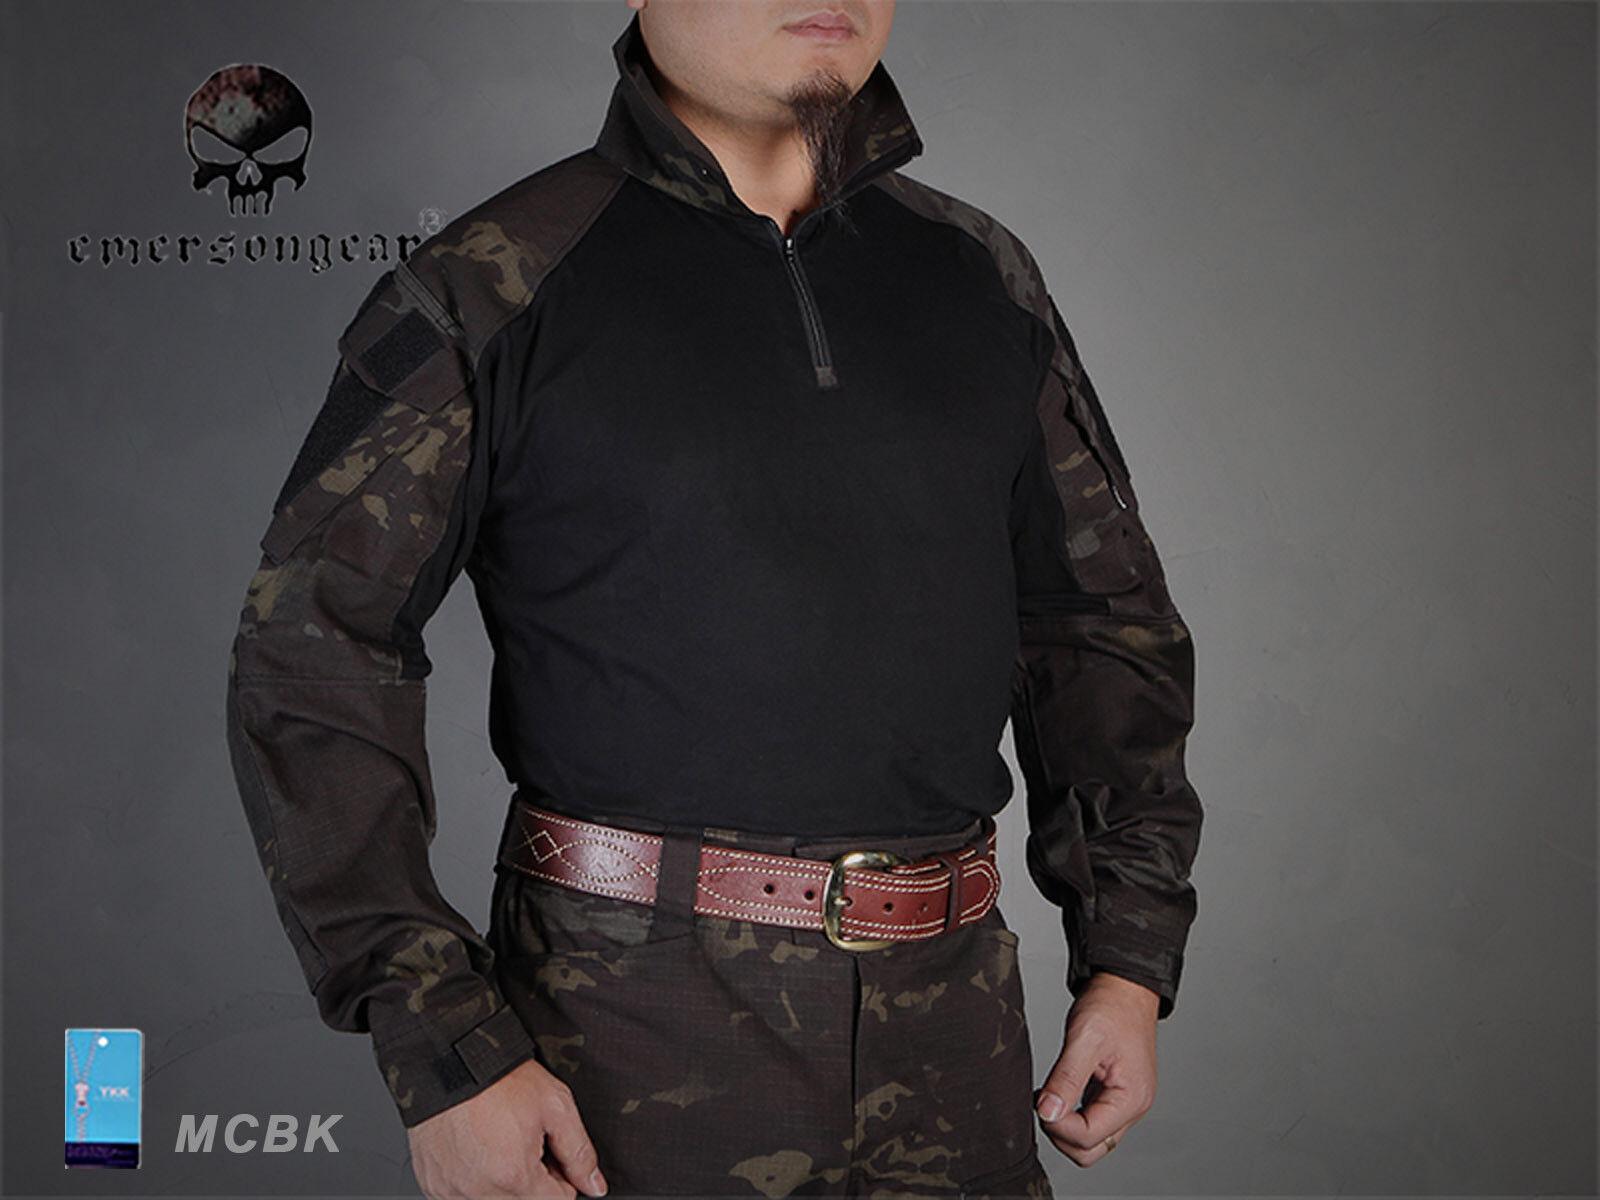 Men Airsoft Hunting Tactical bdu Shirt Emerson Combat Gen3  MCBK  fashion